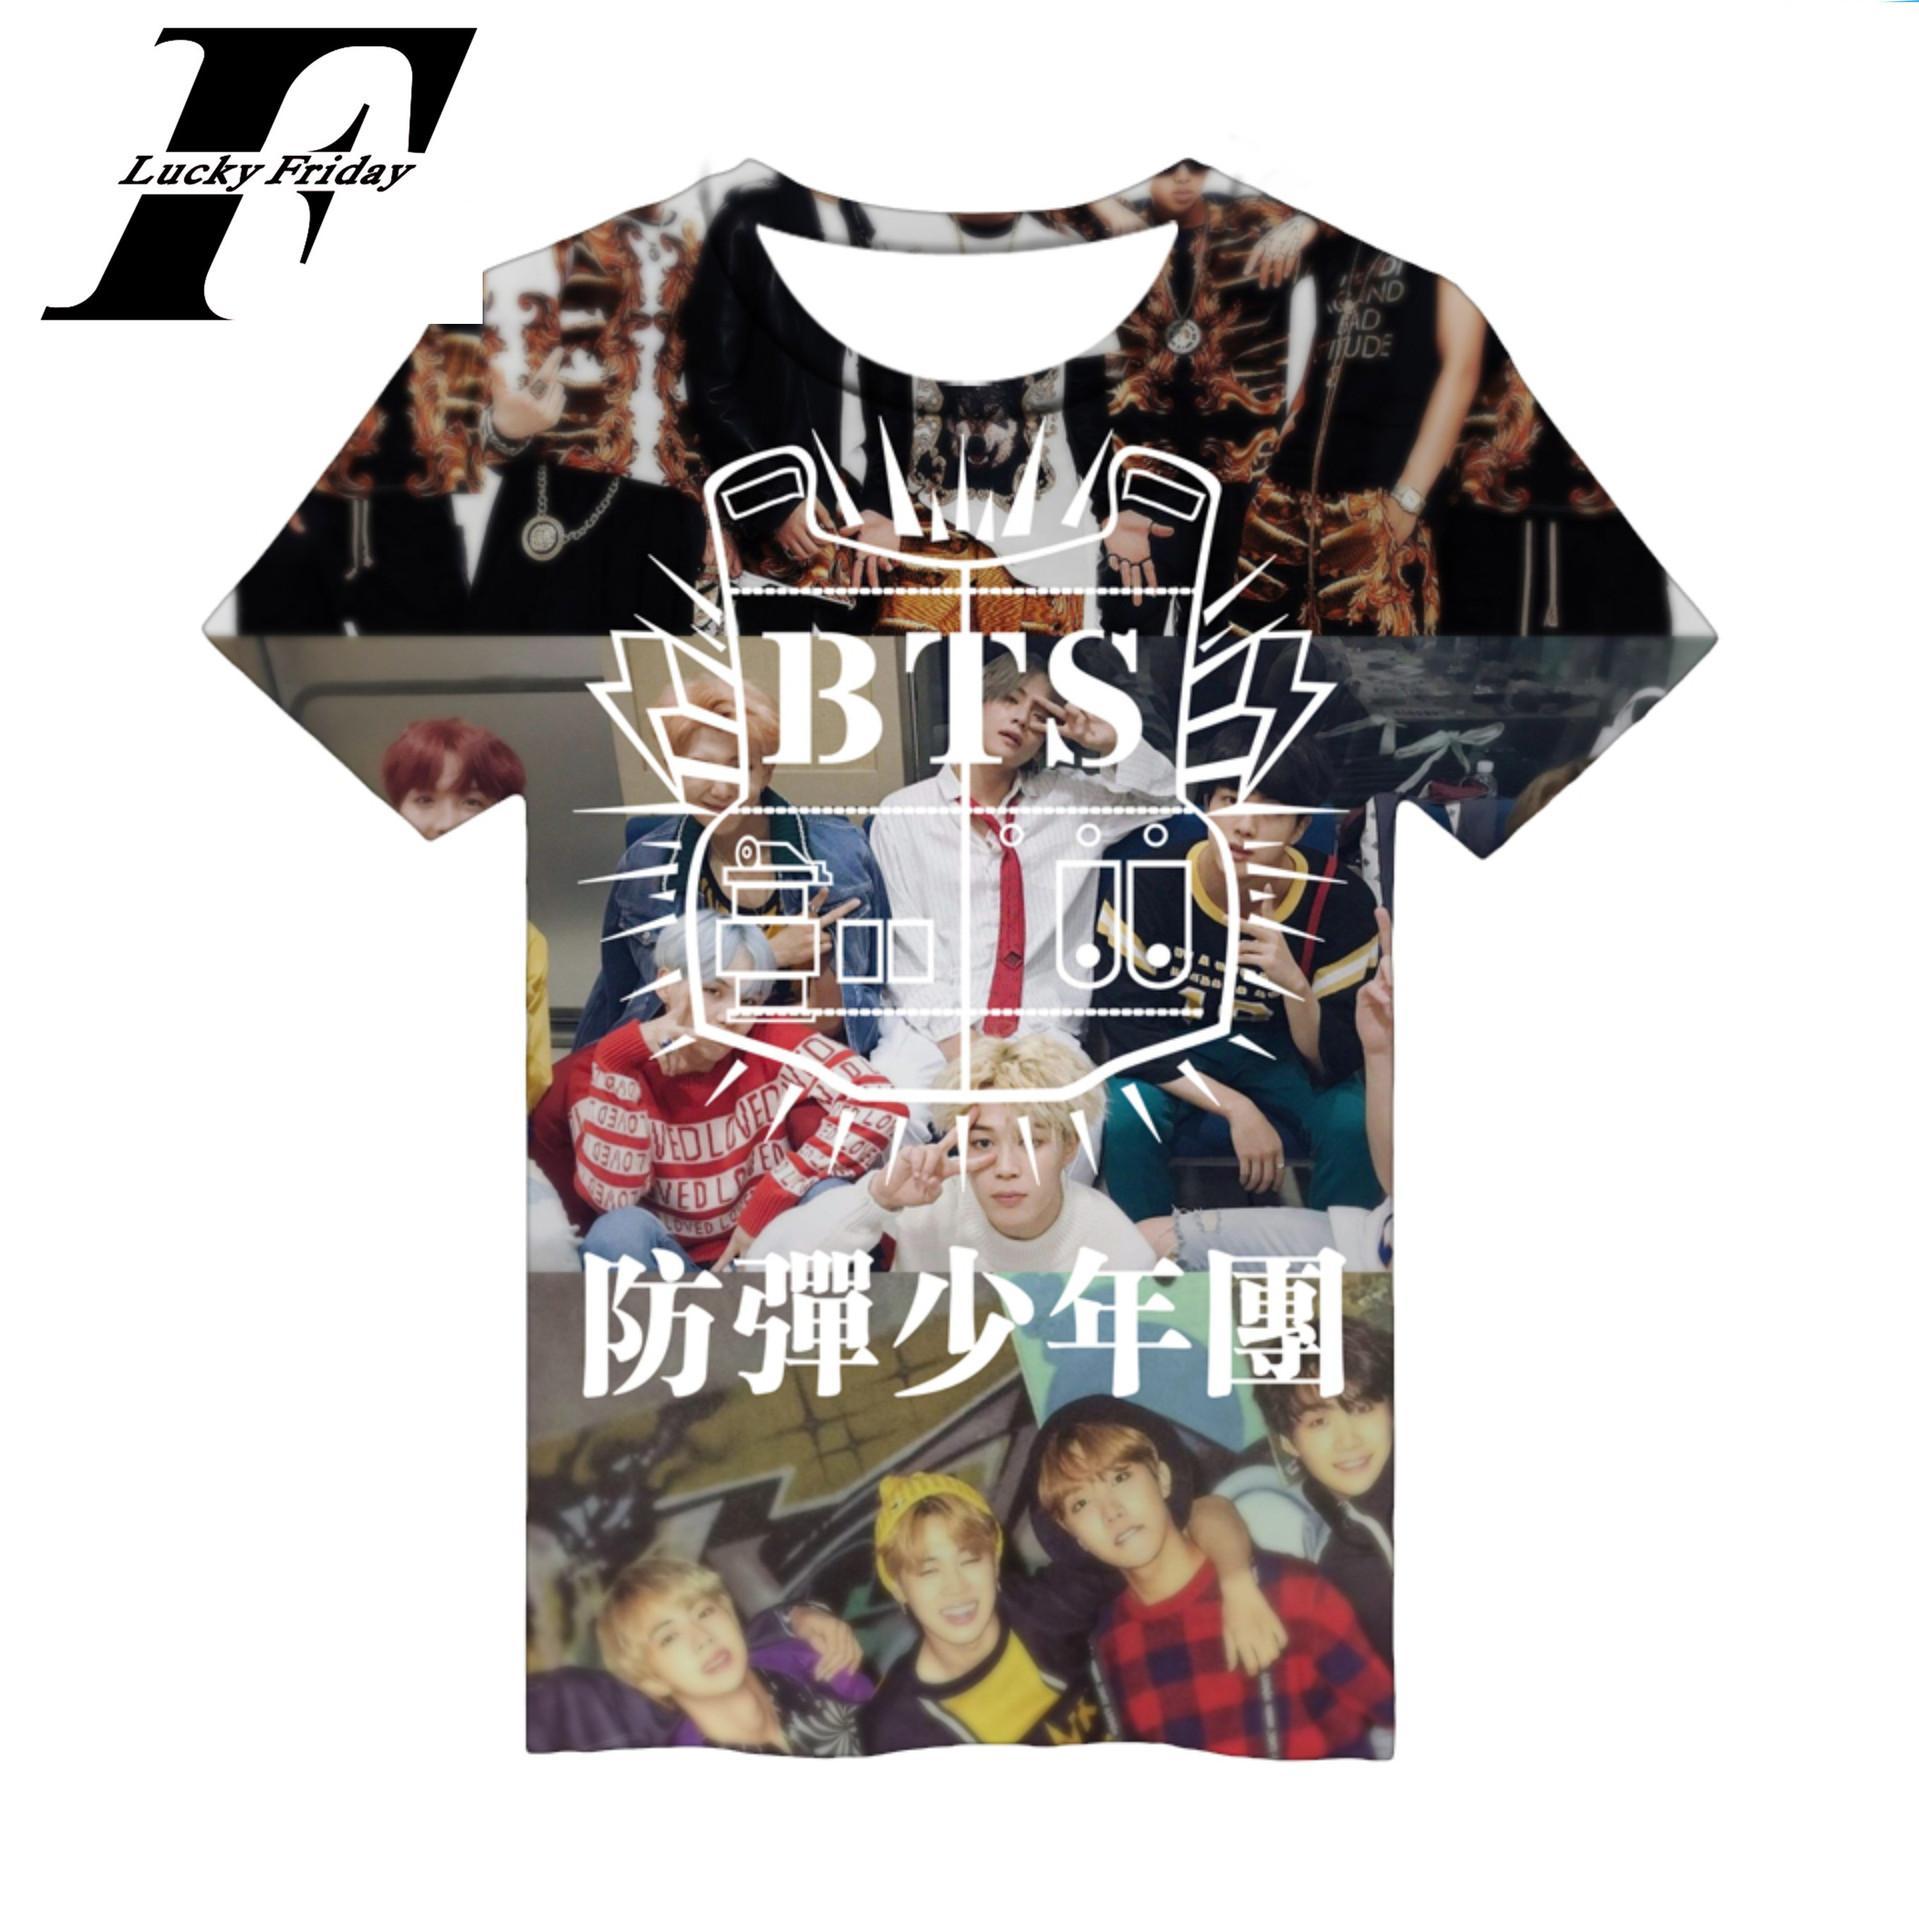 Wholesale T Shirt Digital Printing Machine Rockwall Auction